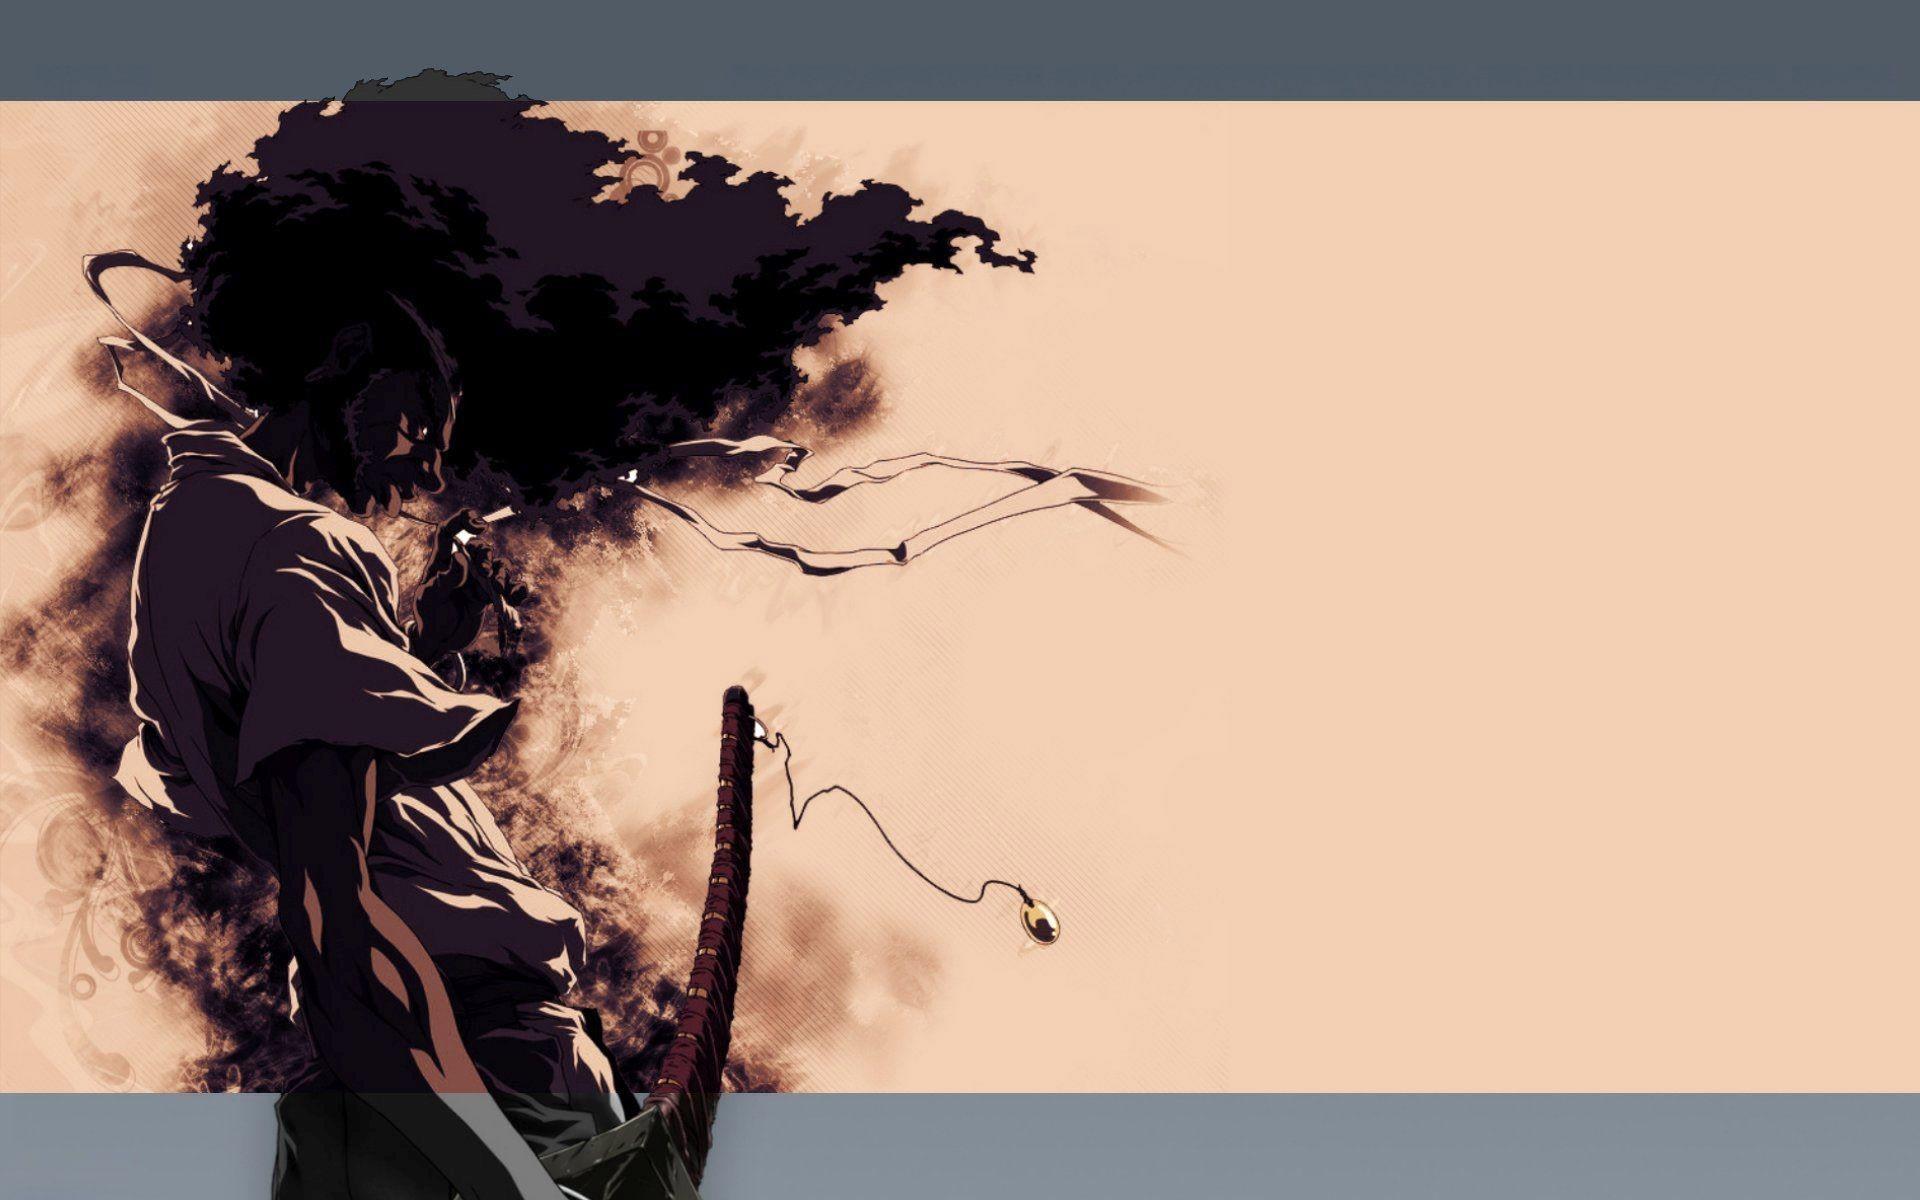 Afro Samurai Wallpaper ·① WallpaperTag